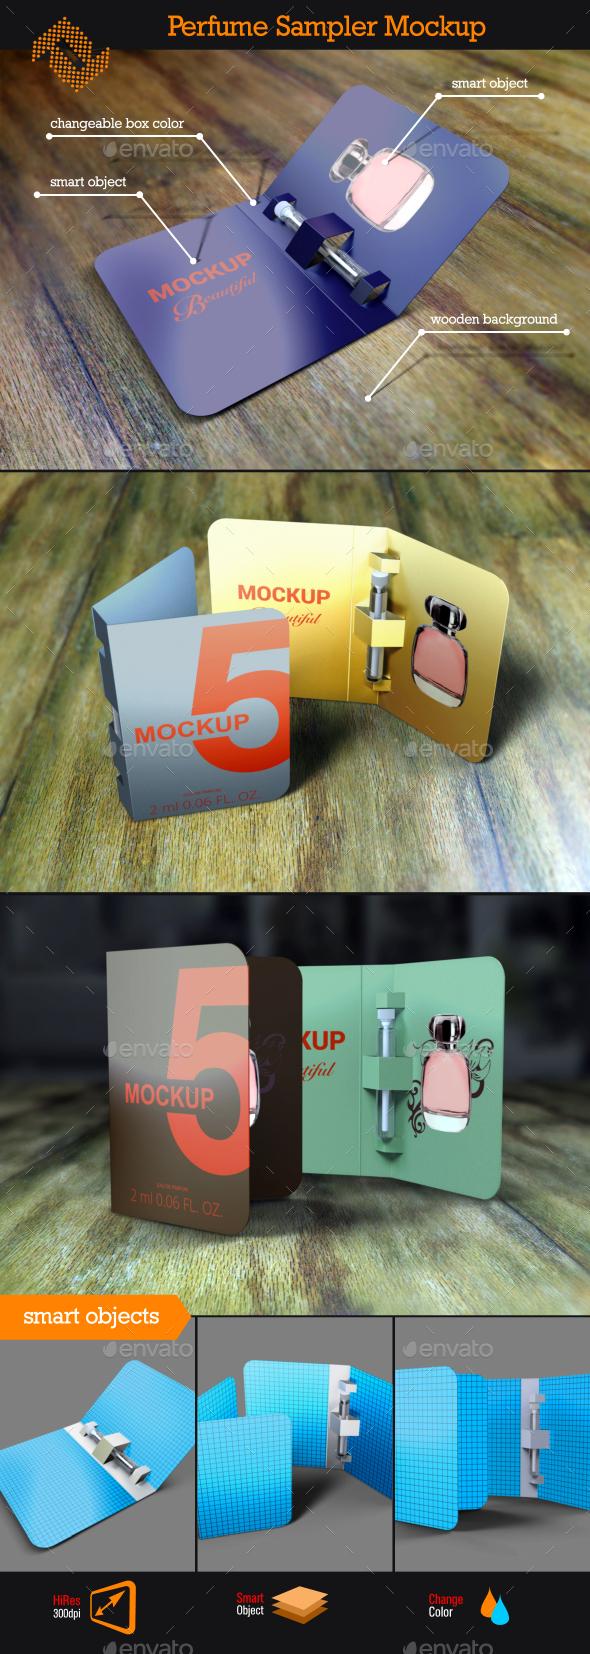 GraphicRiver Perfume Sampler Mockup 10376794